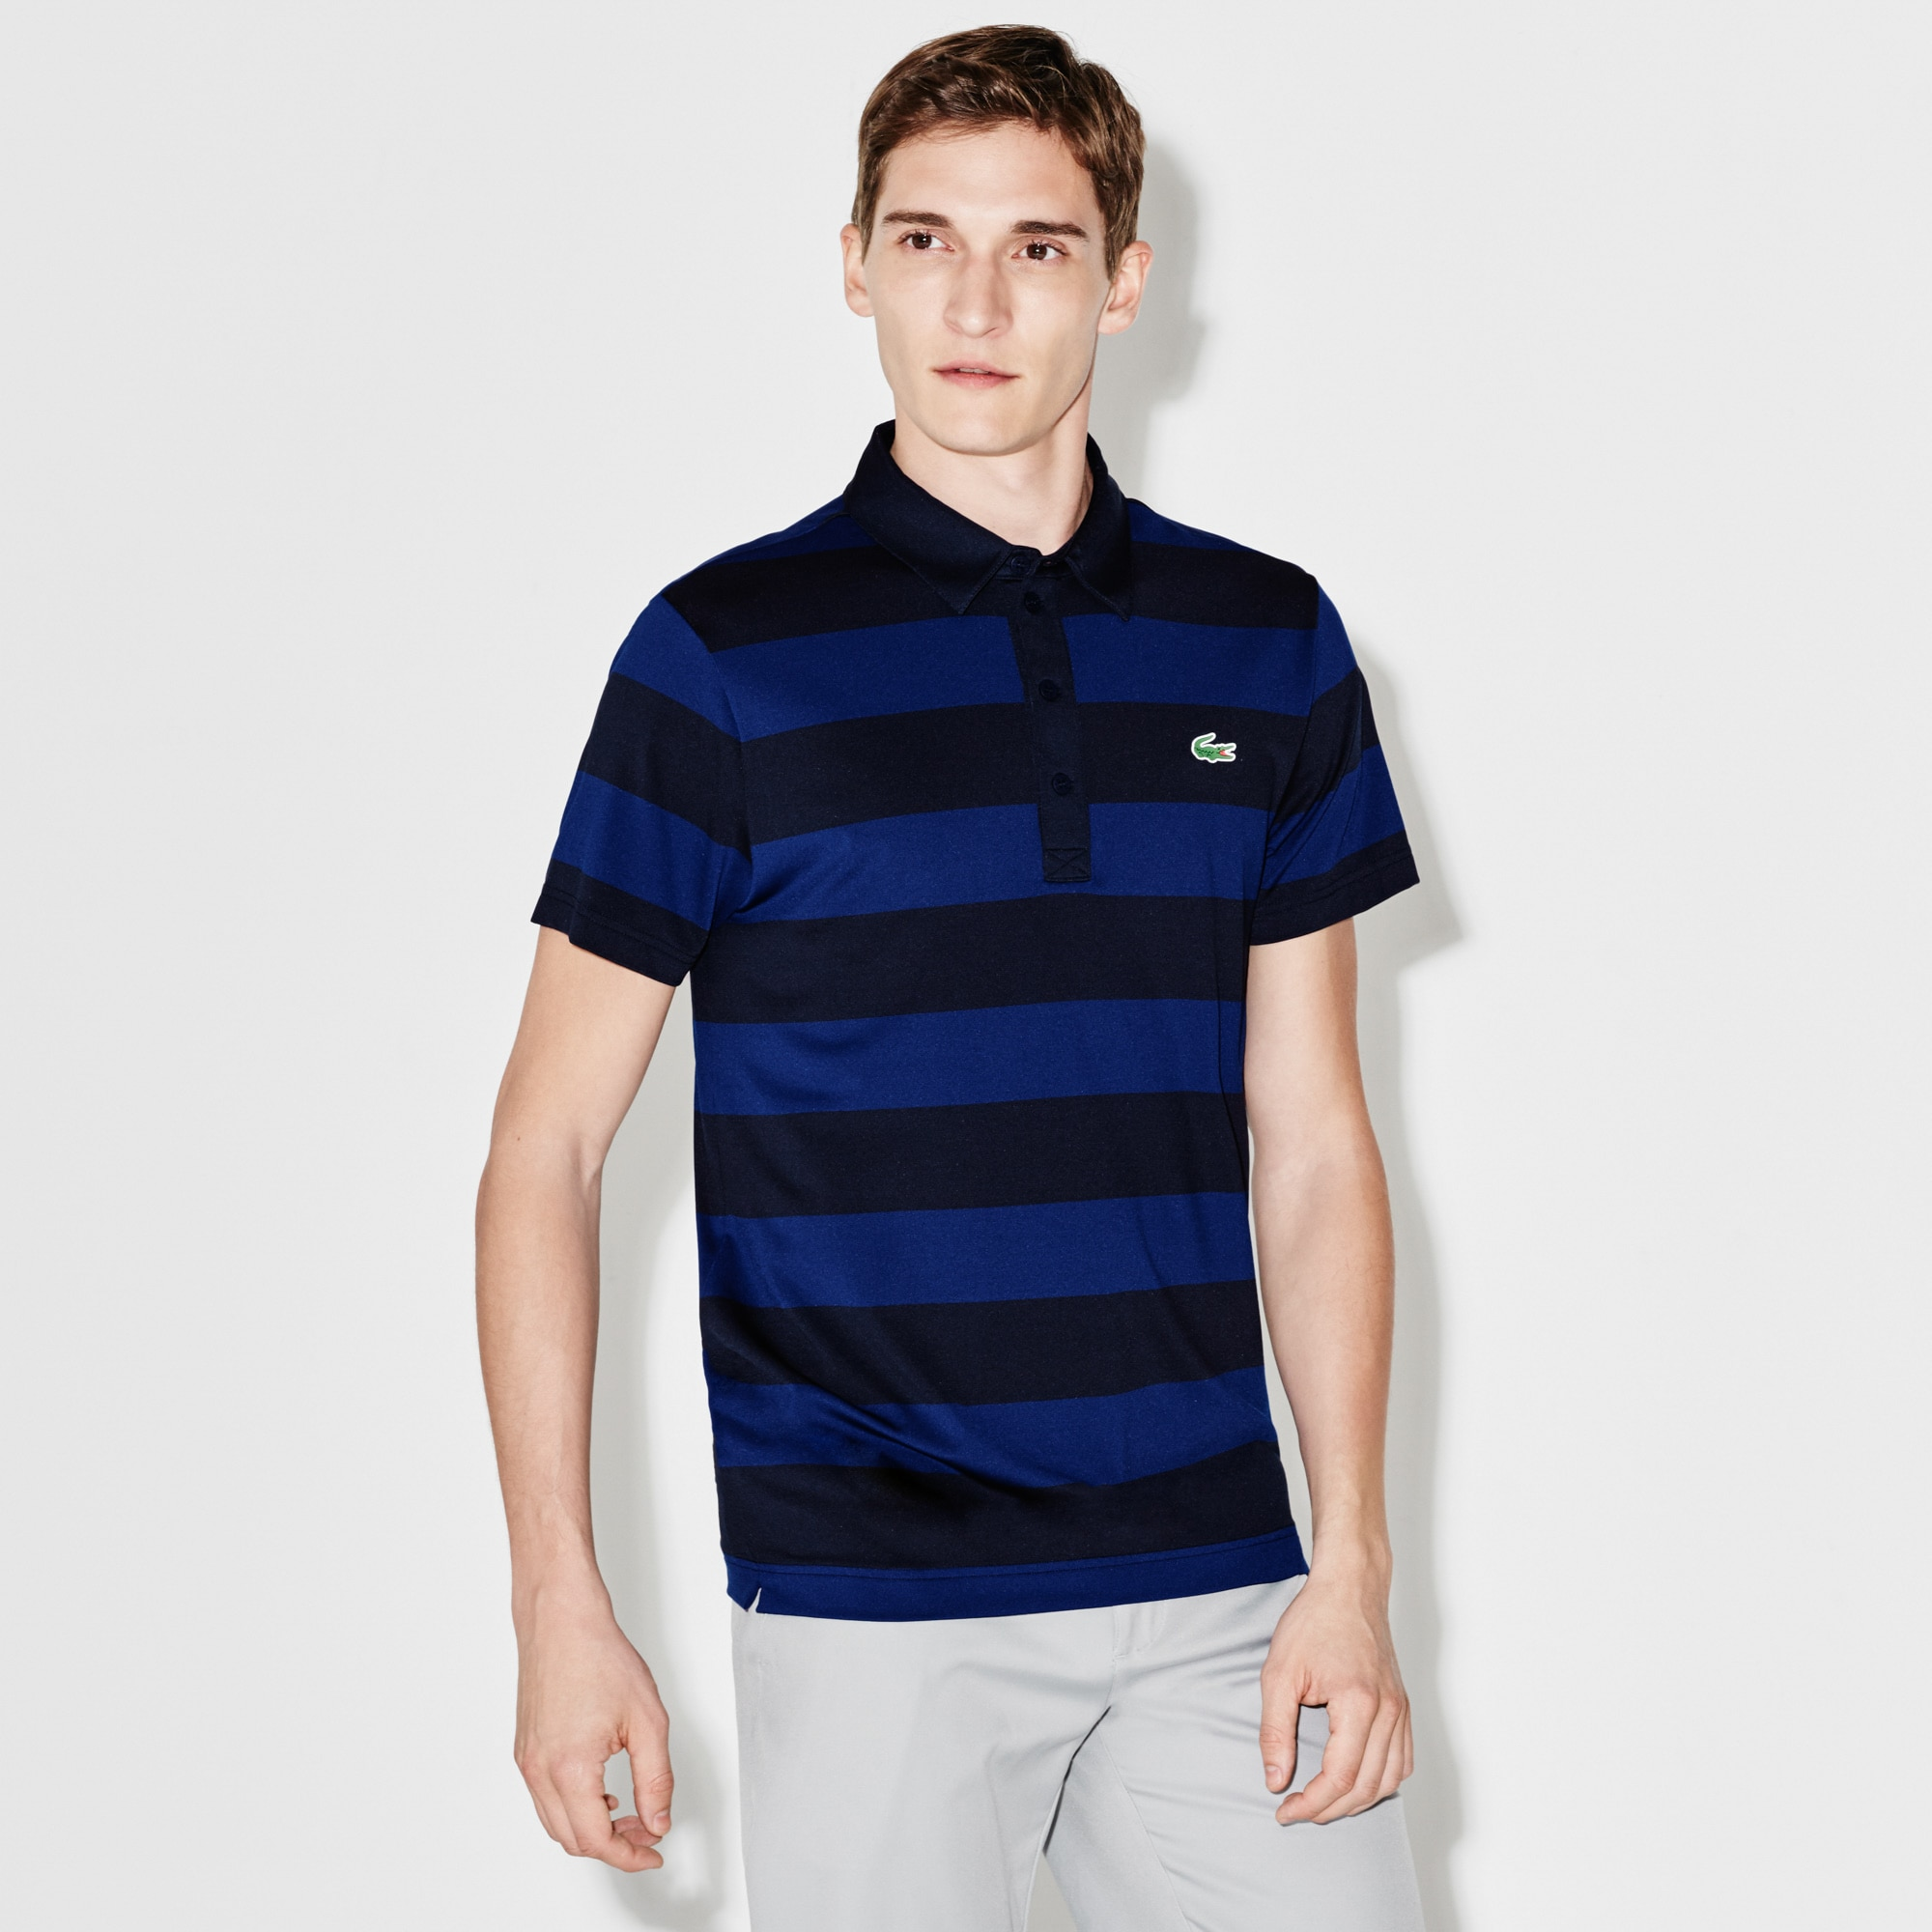 Men's  SPORT Golf Striped Stretch Tech Jersey Polo